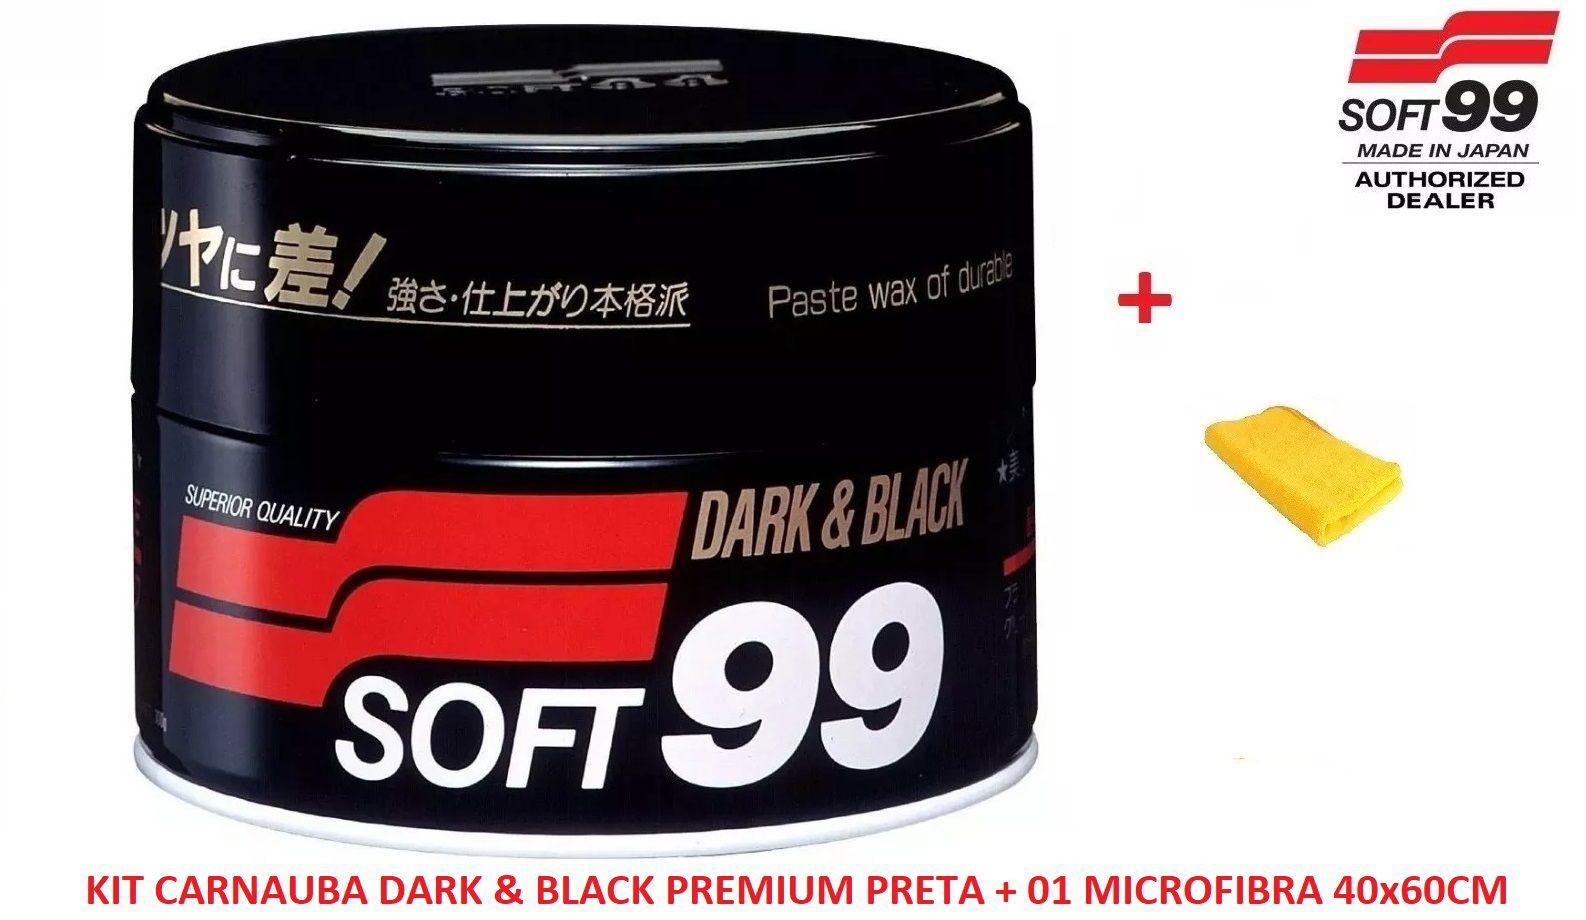 Kit c/ Cera De Carnaúba Premium 300g Soft99 Dark & Black Paste Wax  + 01 Flanela Toalha Microfibra 40 X 60 Cm Autoamerica (sem embalagem / blister)